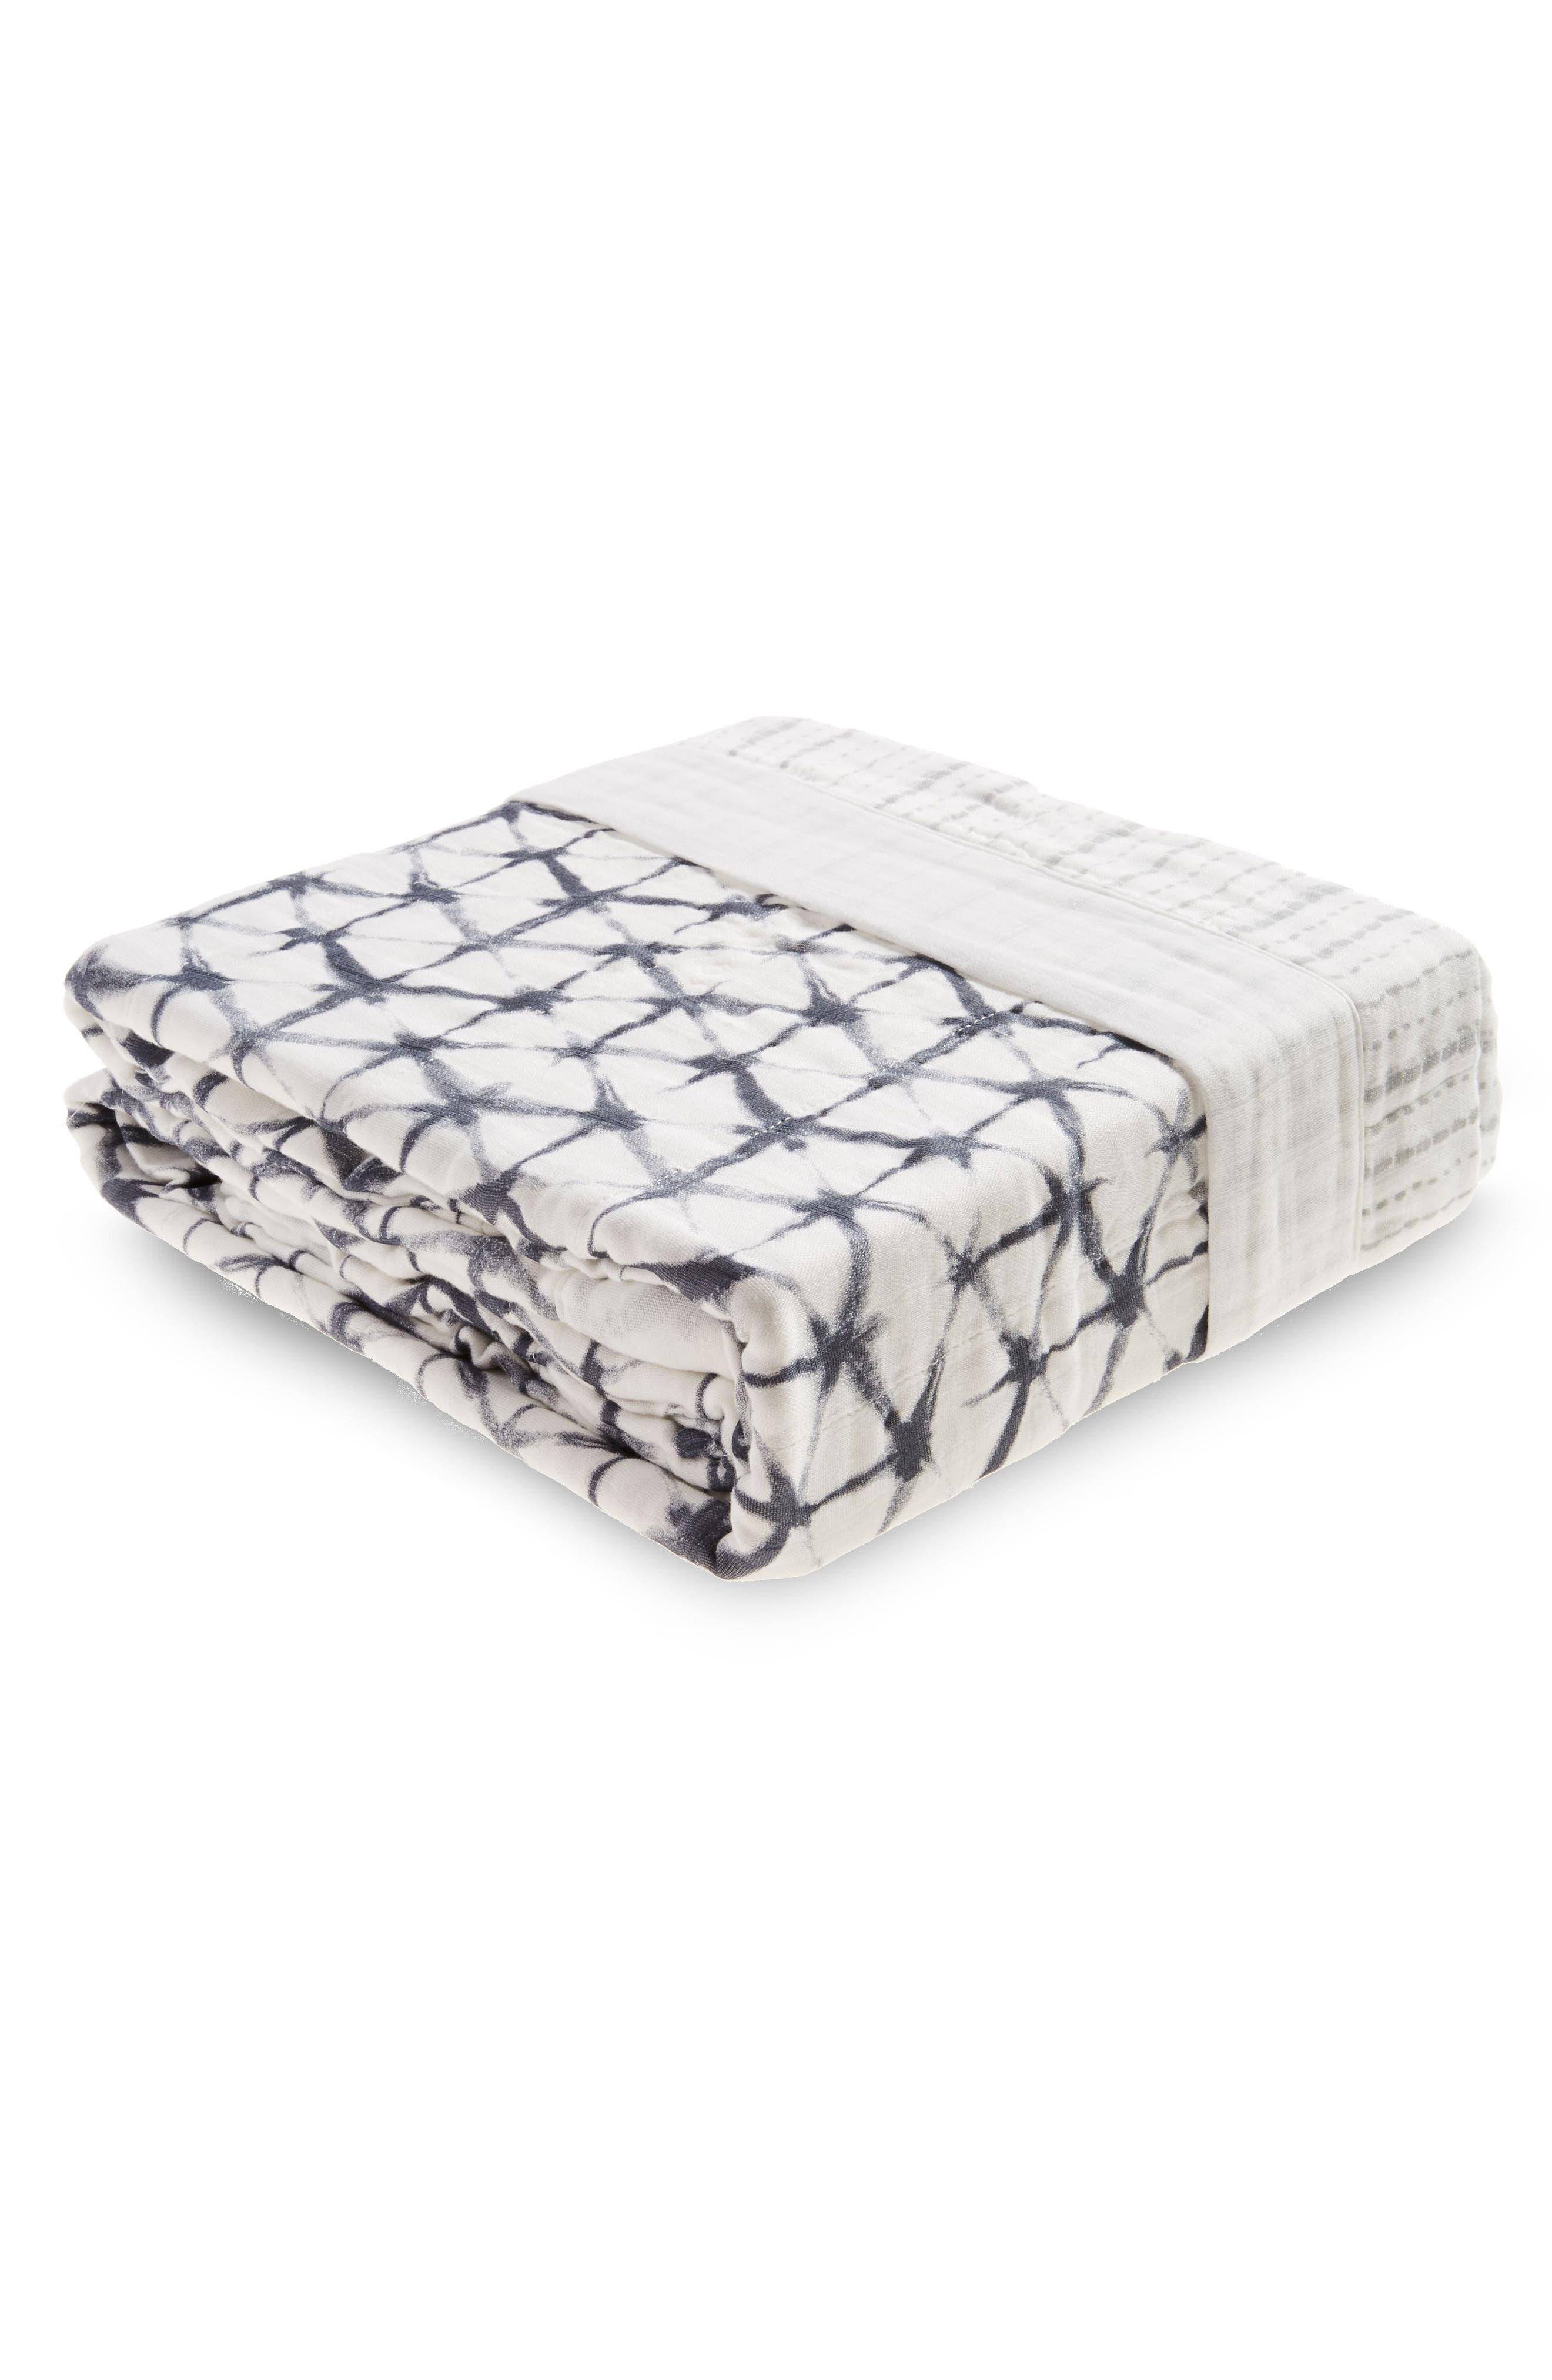 Oversize Muslin Blanket,                         Main,                         color, Pebble Shibori